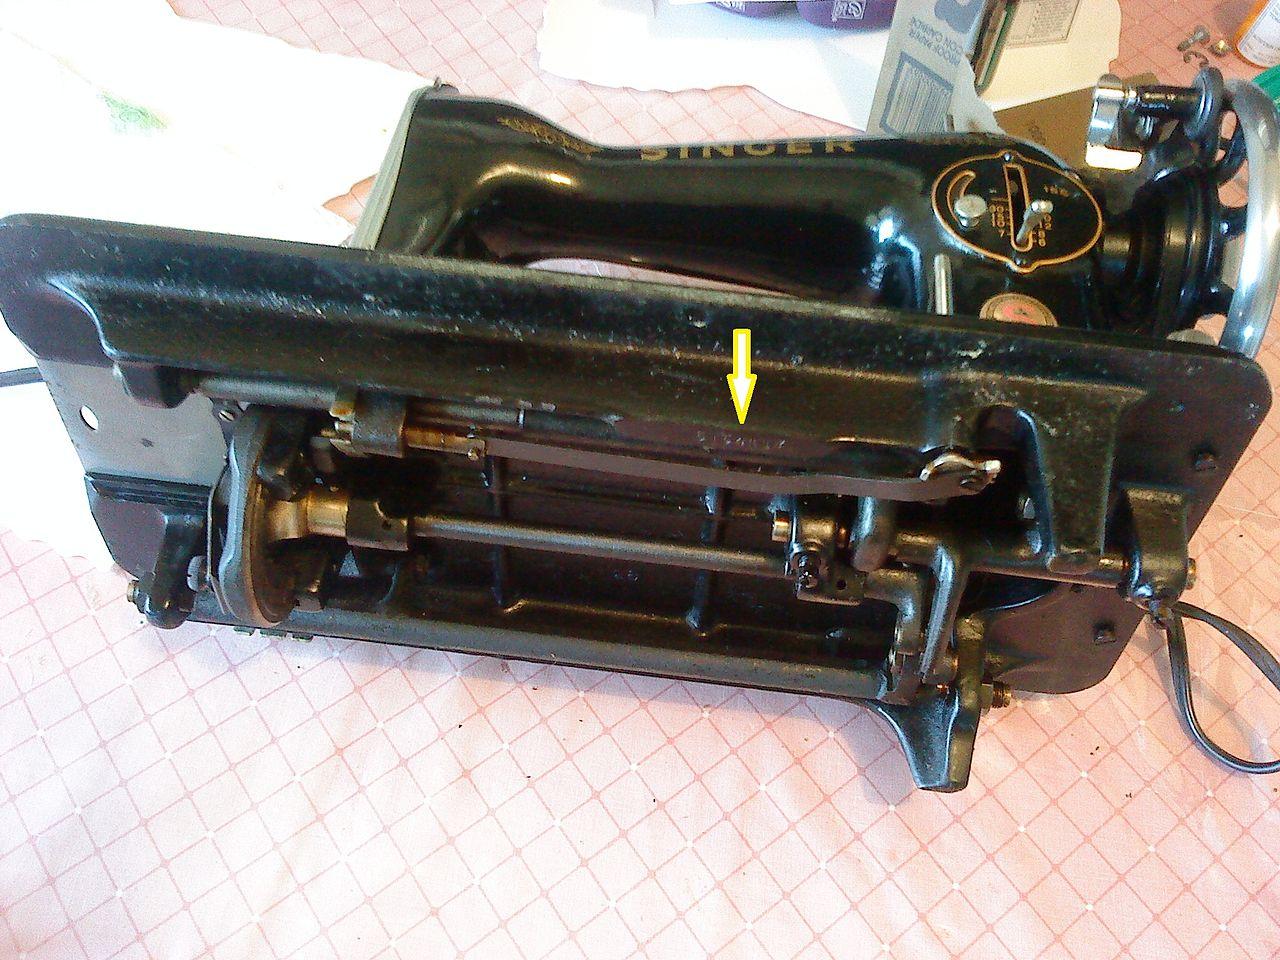 Archivo:Maquina de coser singer la negrita 02.JPG